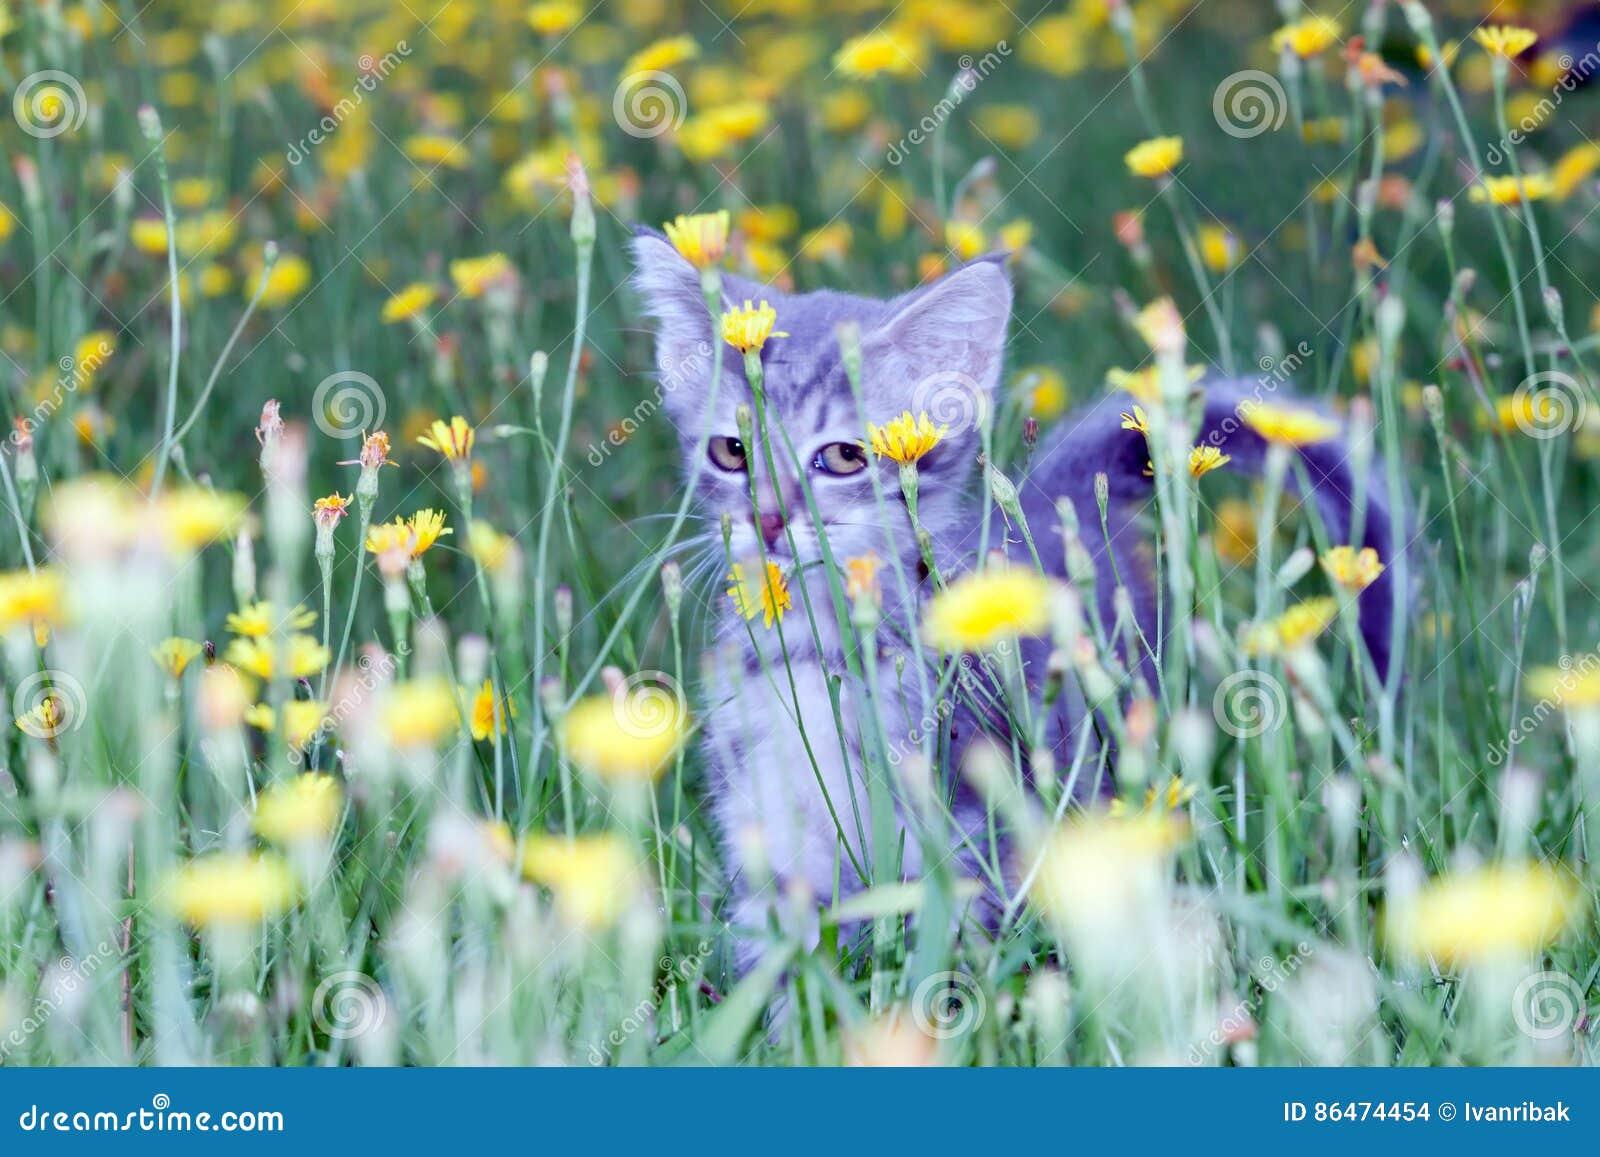 Petit chaton maladroit sur